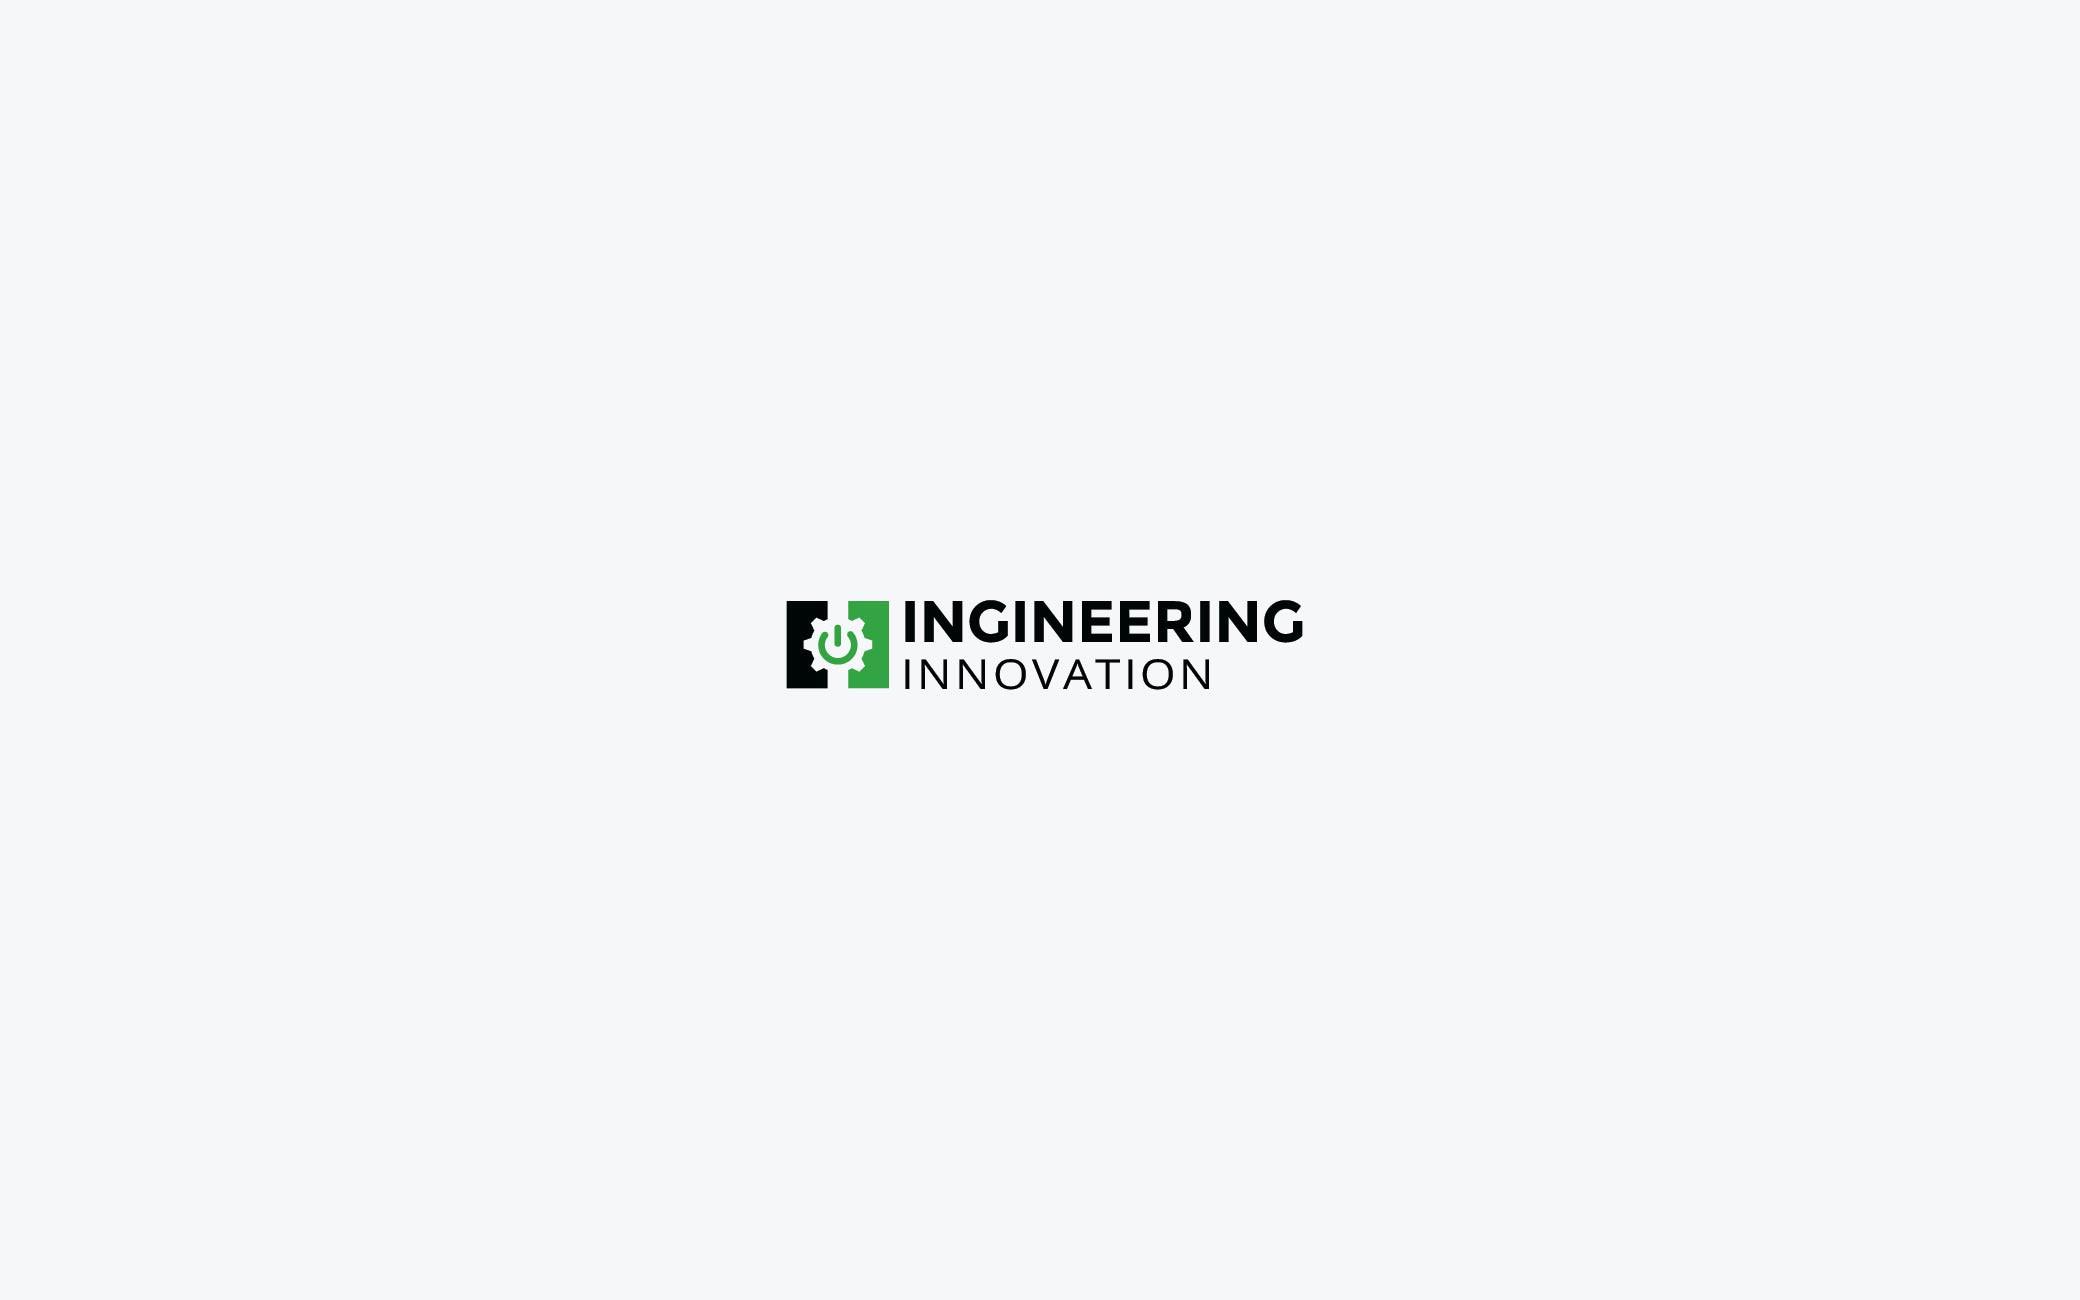 Logo design for Ingineering Innovation